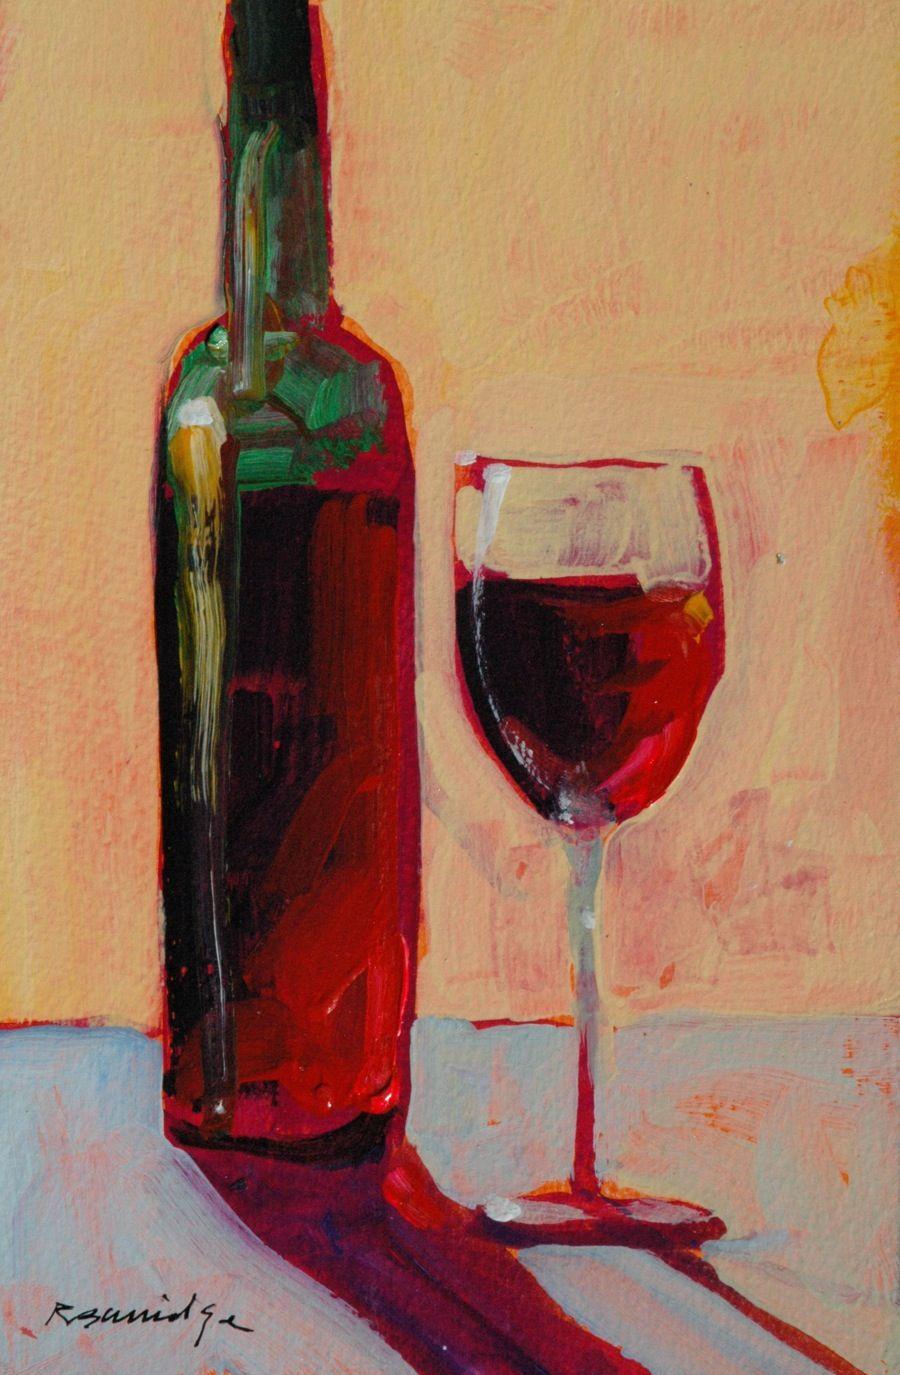 Wine Bottle Paintings Sedona Arts Center Faculty Blog Wine Painting Wine Bottle Drawing Bottle Painting